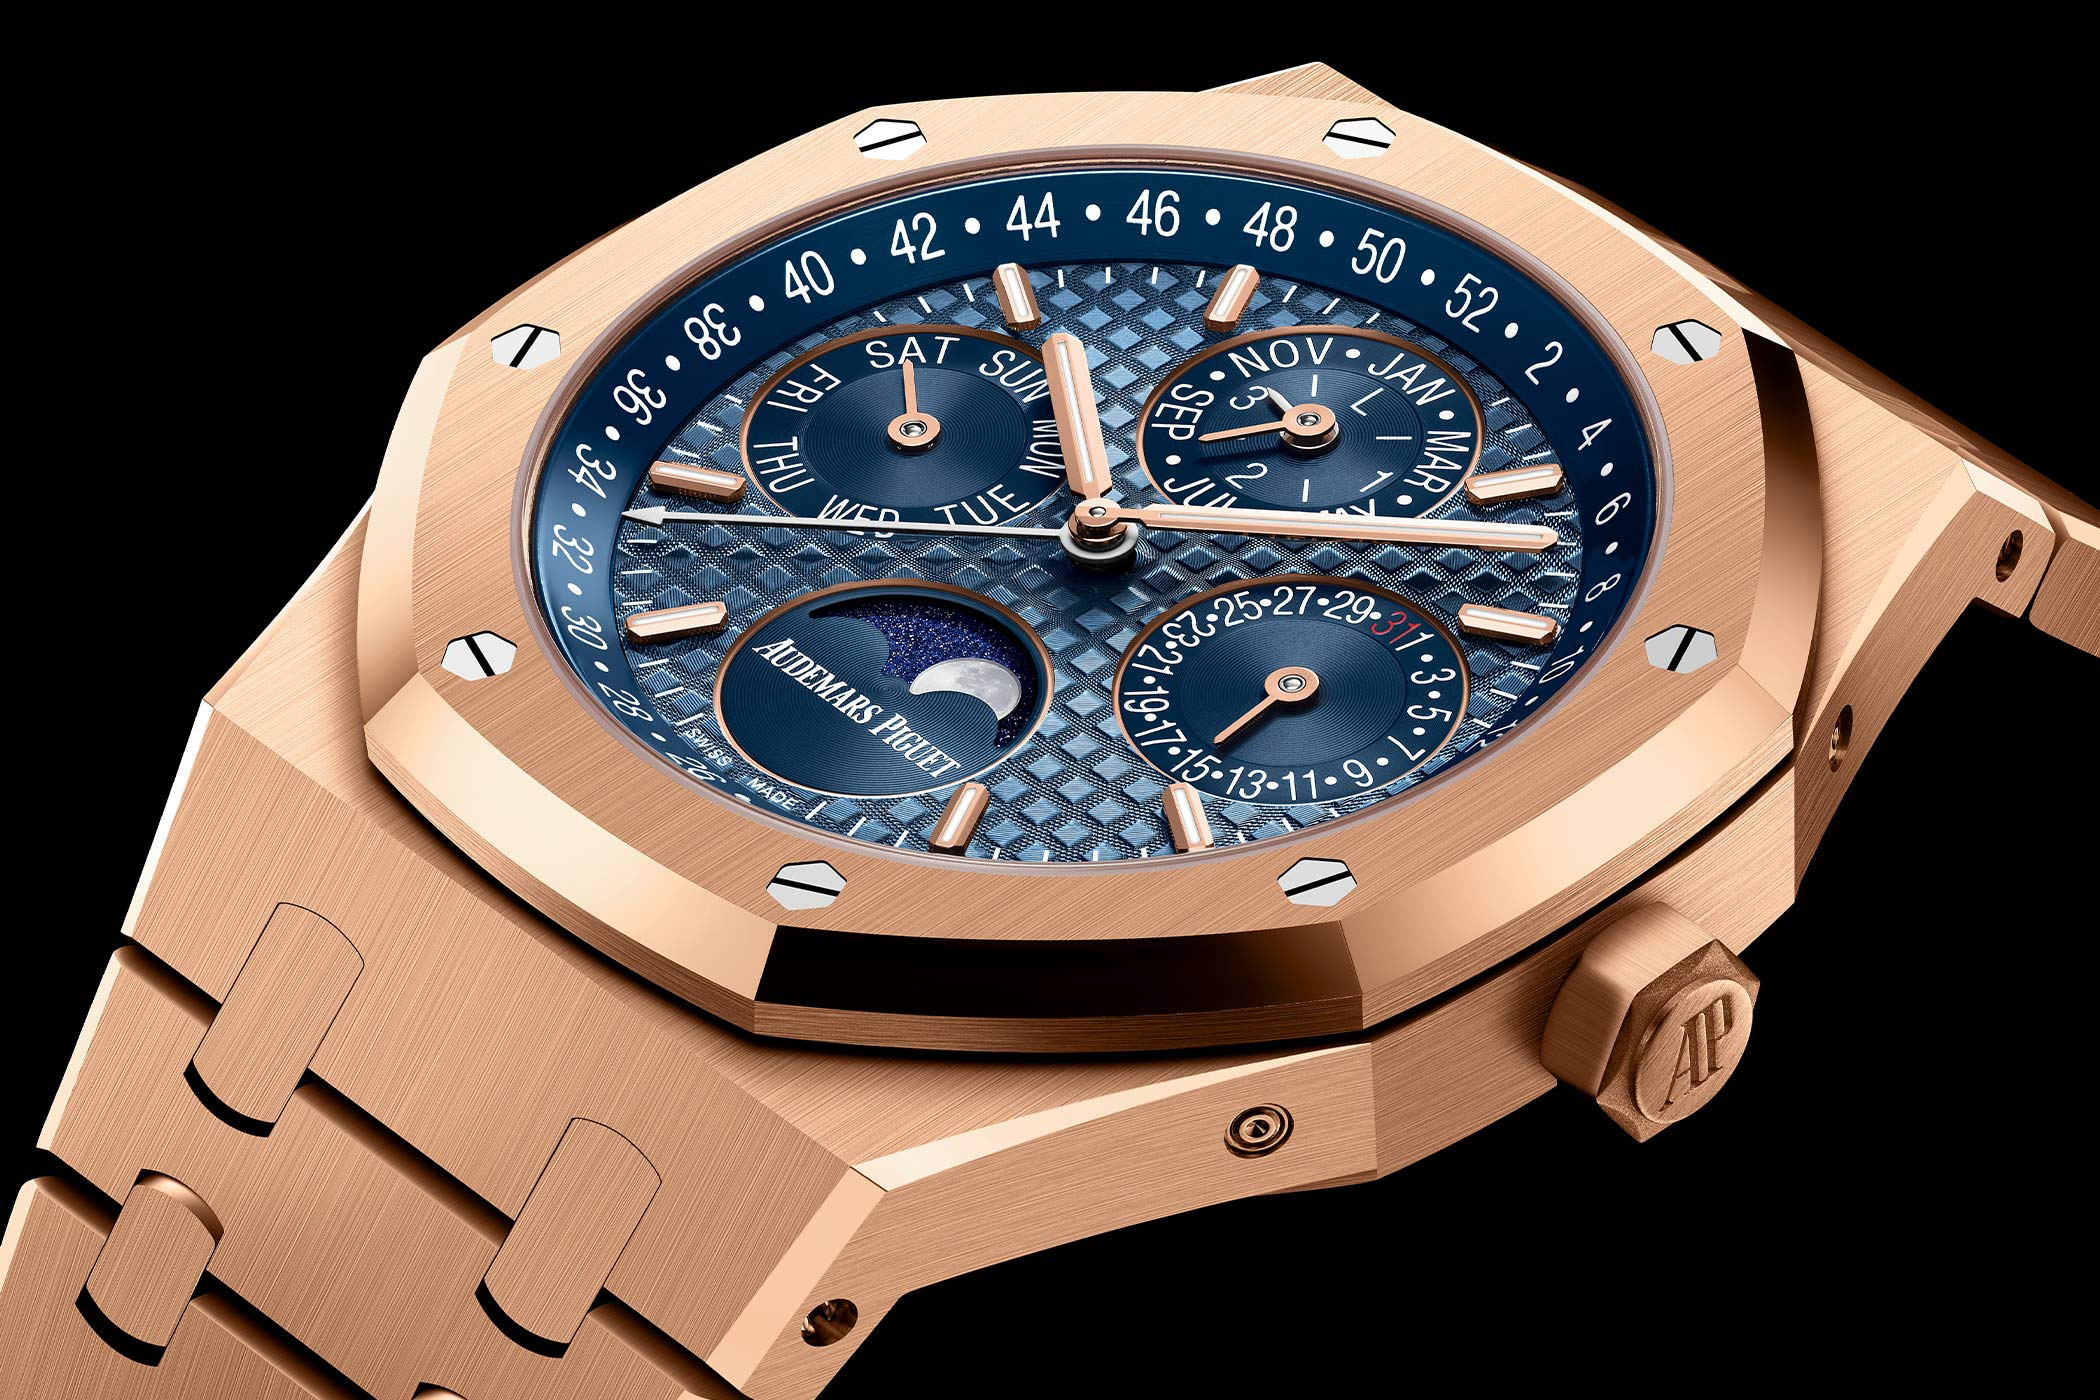 Audemars Piguet Royal Oak Perpetual Calendar 41mm pink gold new shade of blue 2021 - 26574OR.OO.1220OR.03